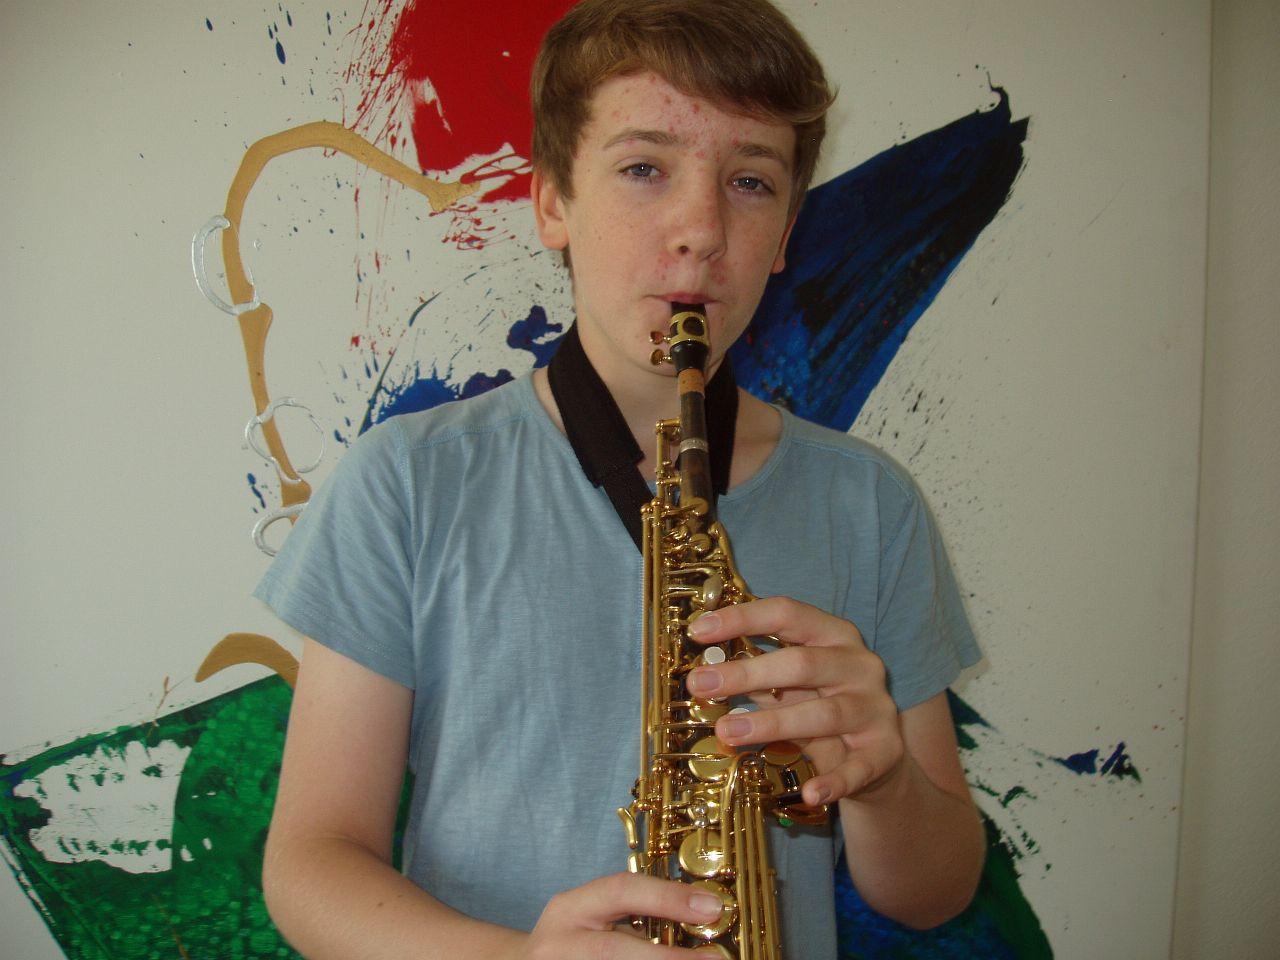 Musiker 146